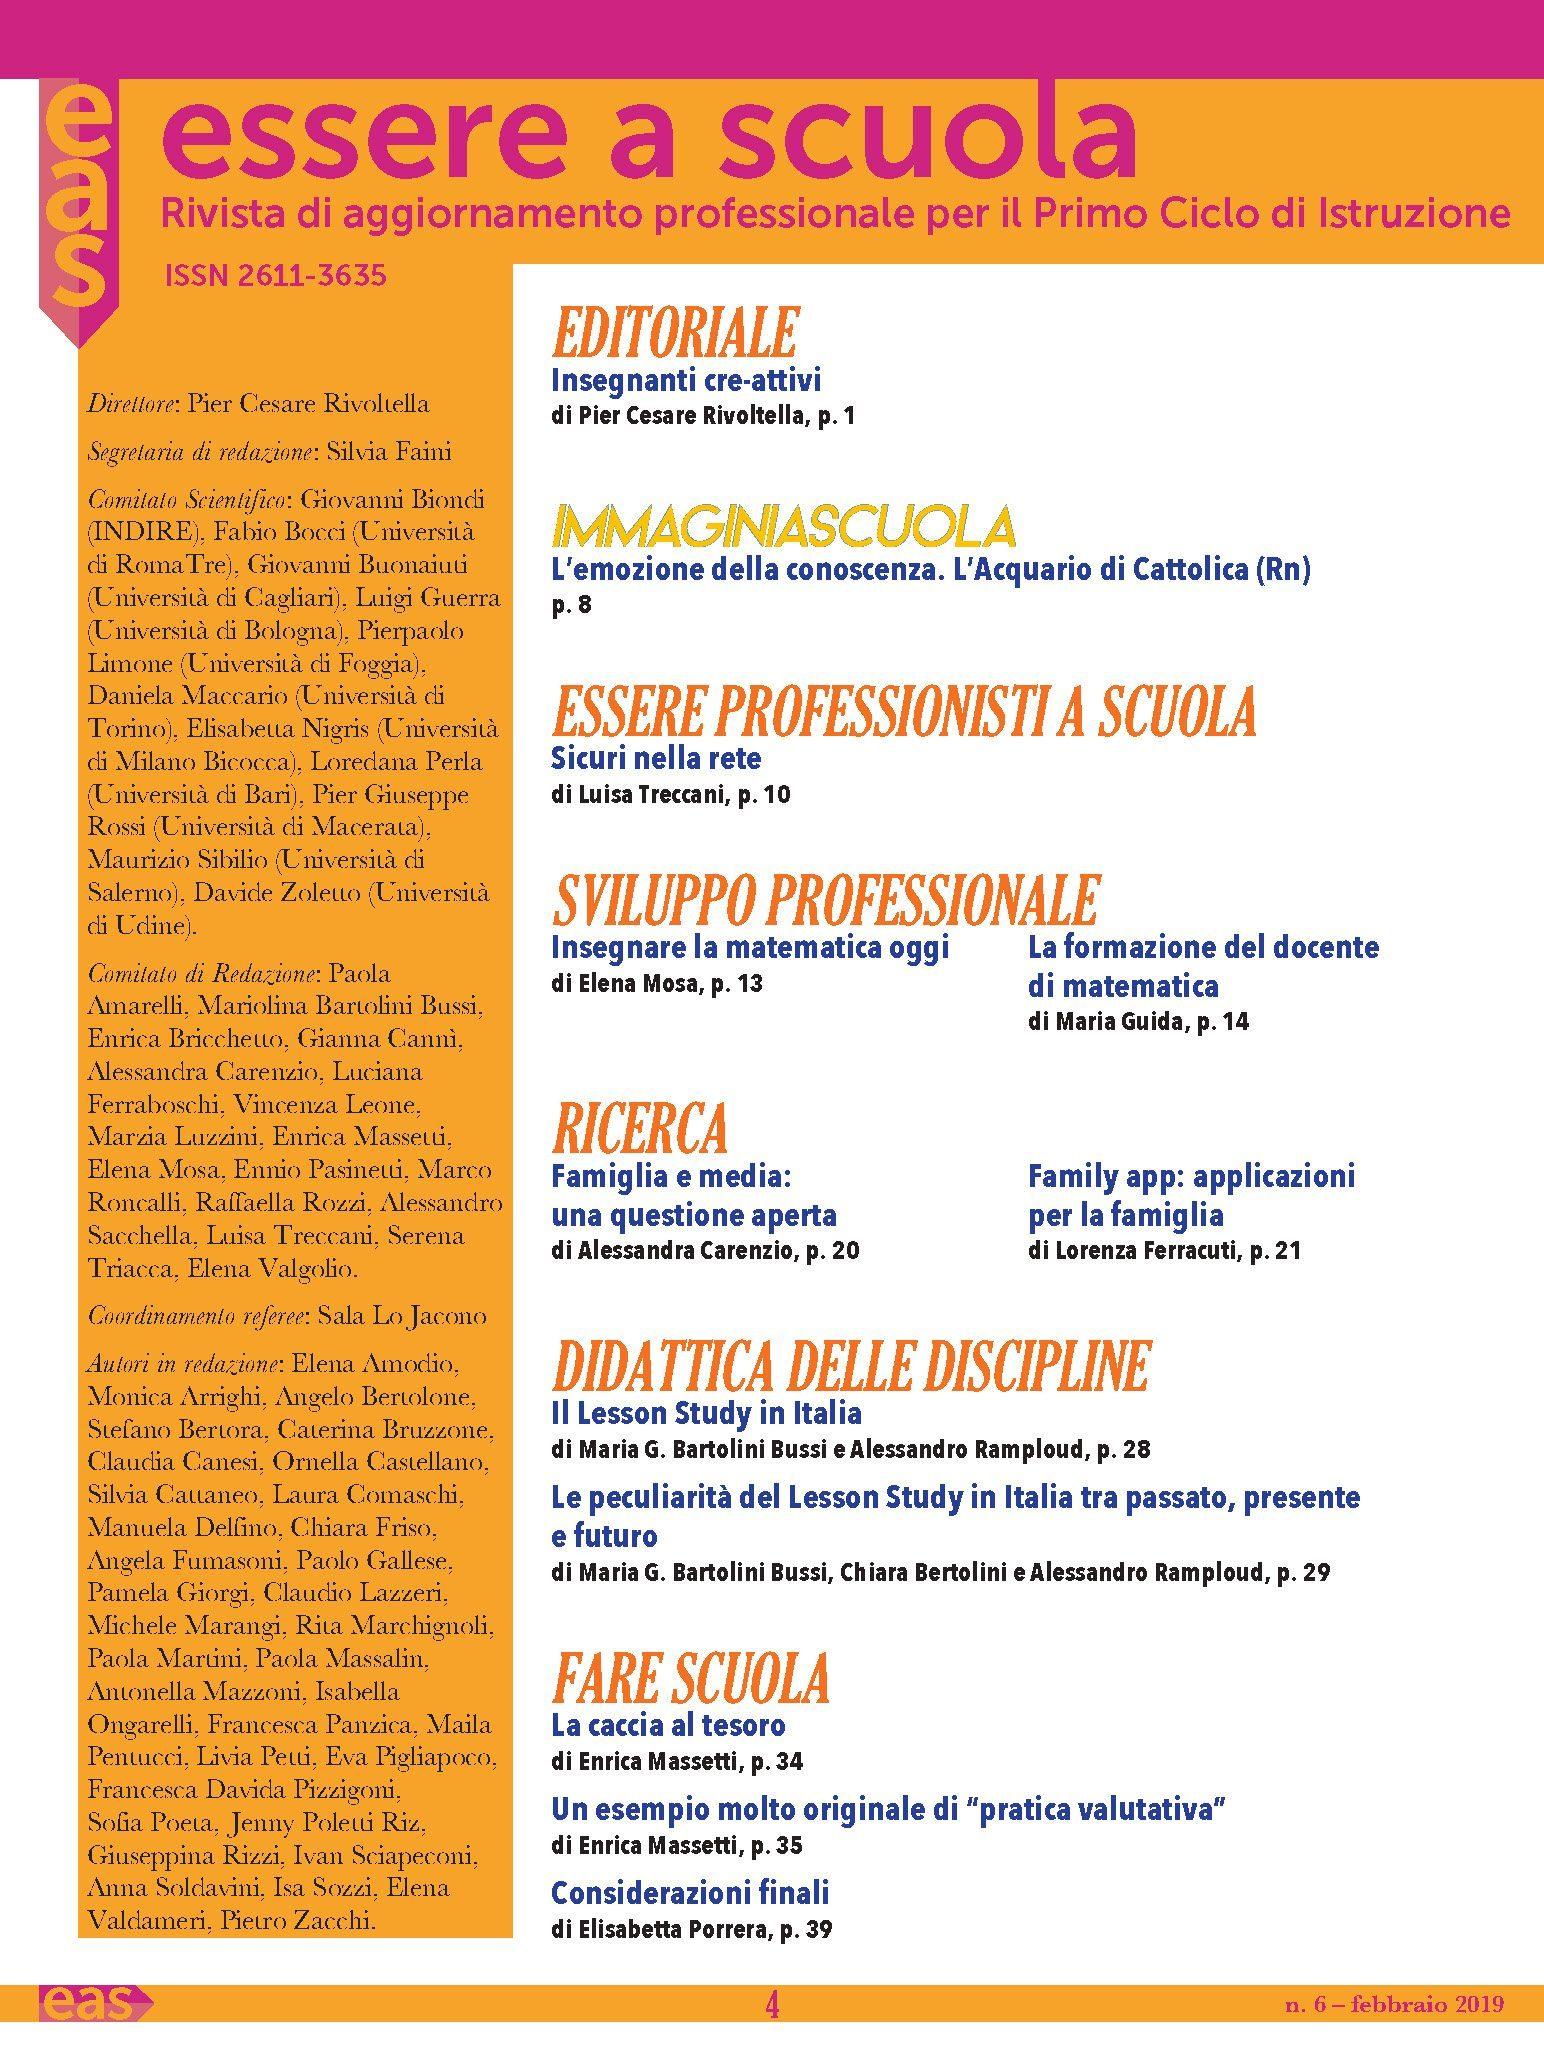 Sommario Eas 6 19_Pagina_1.jpg